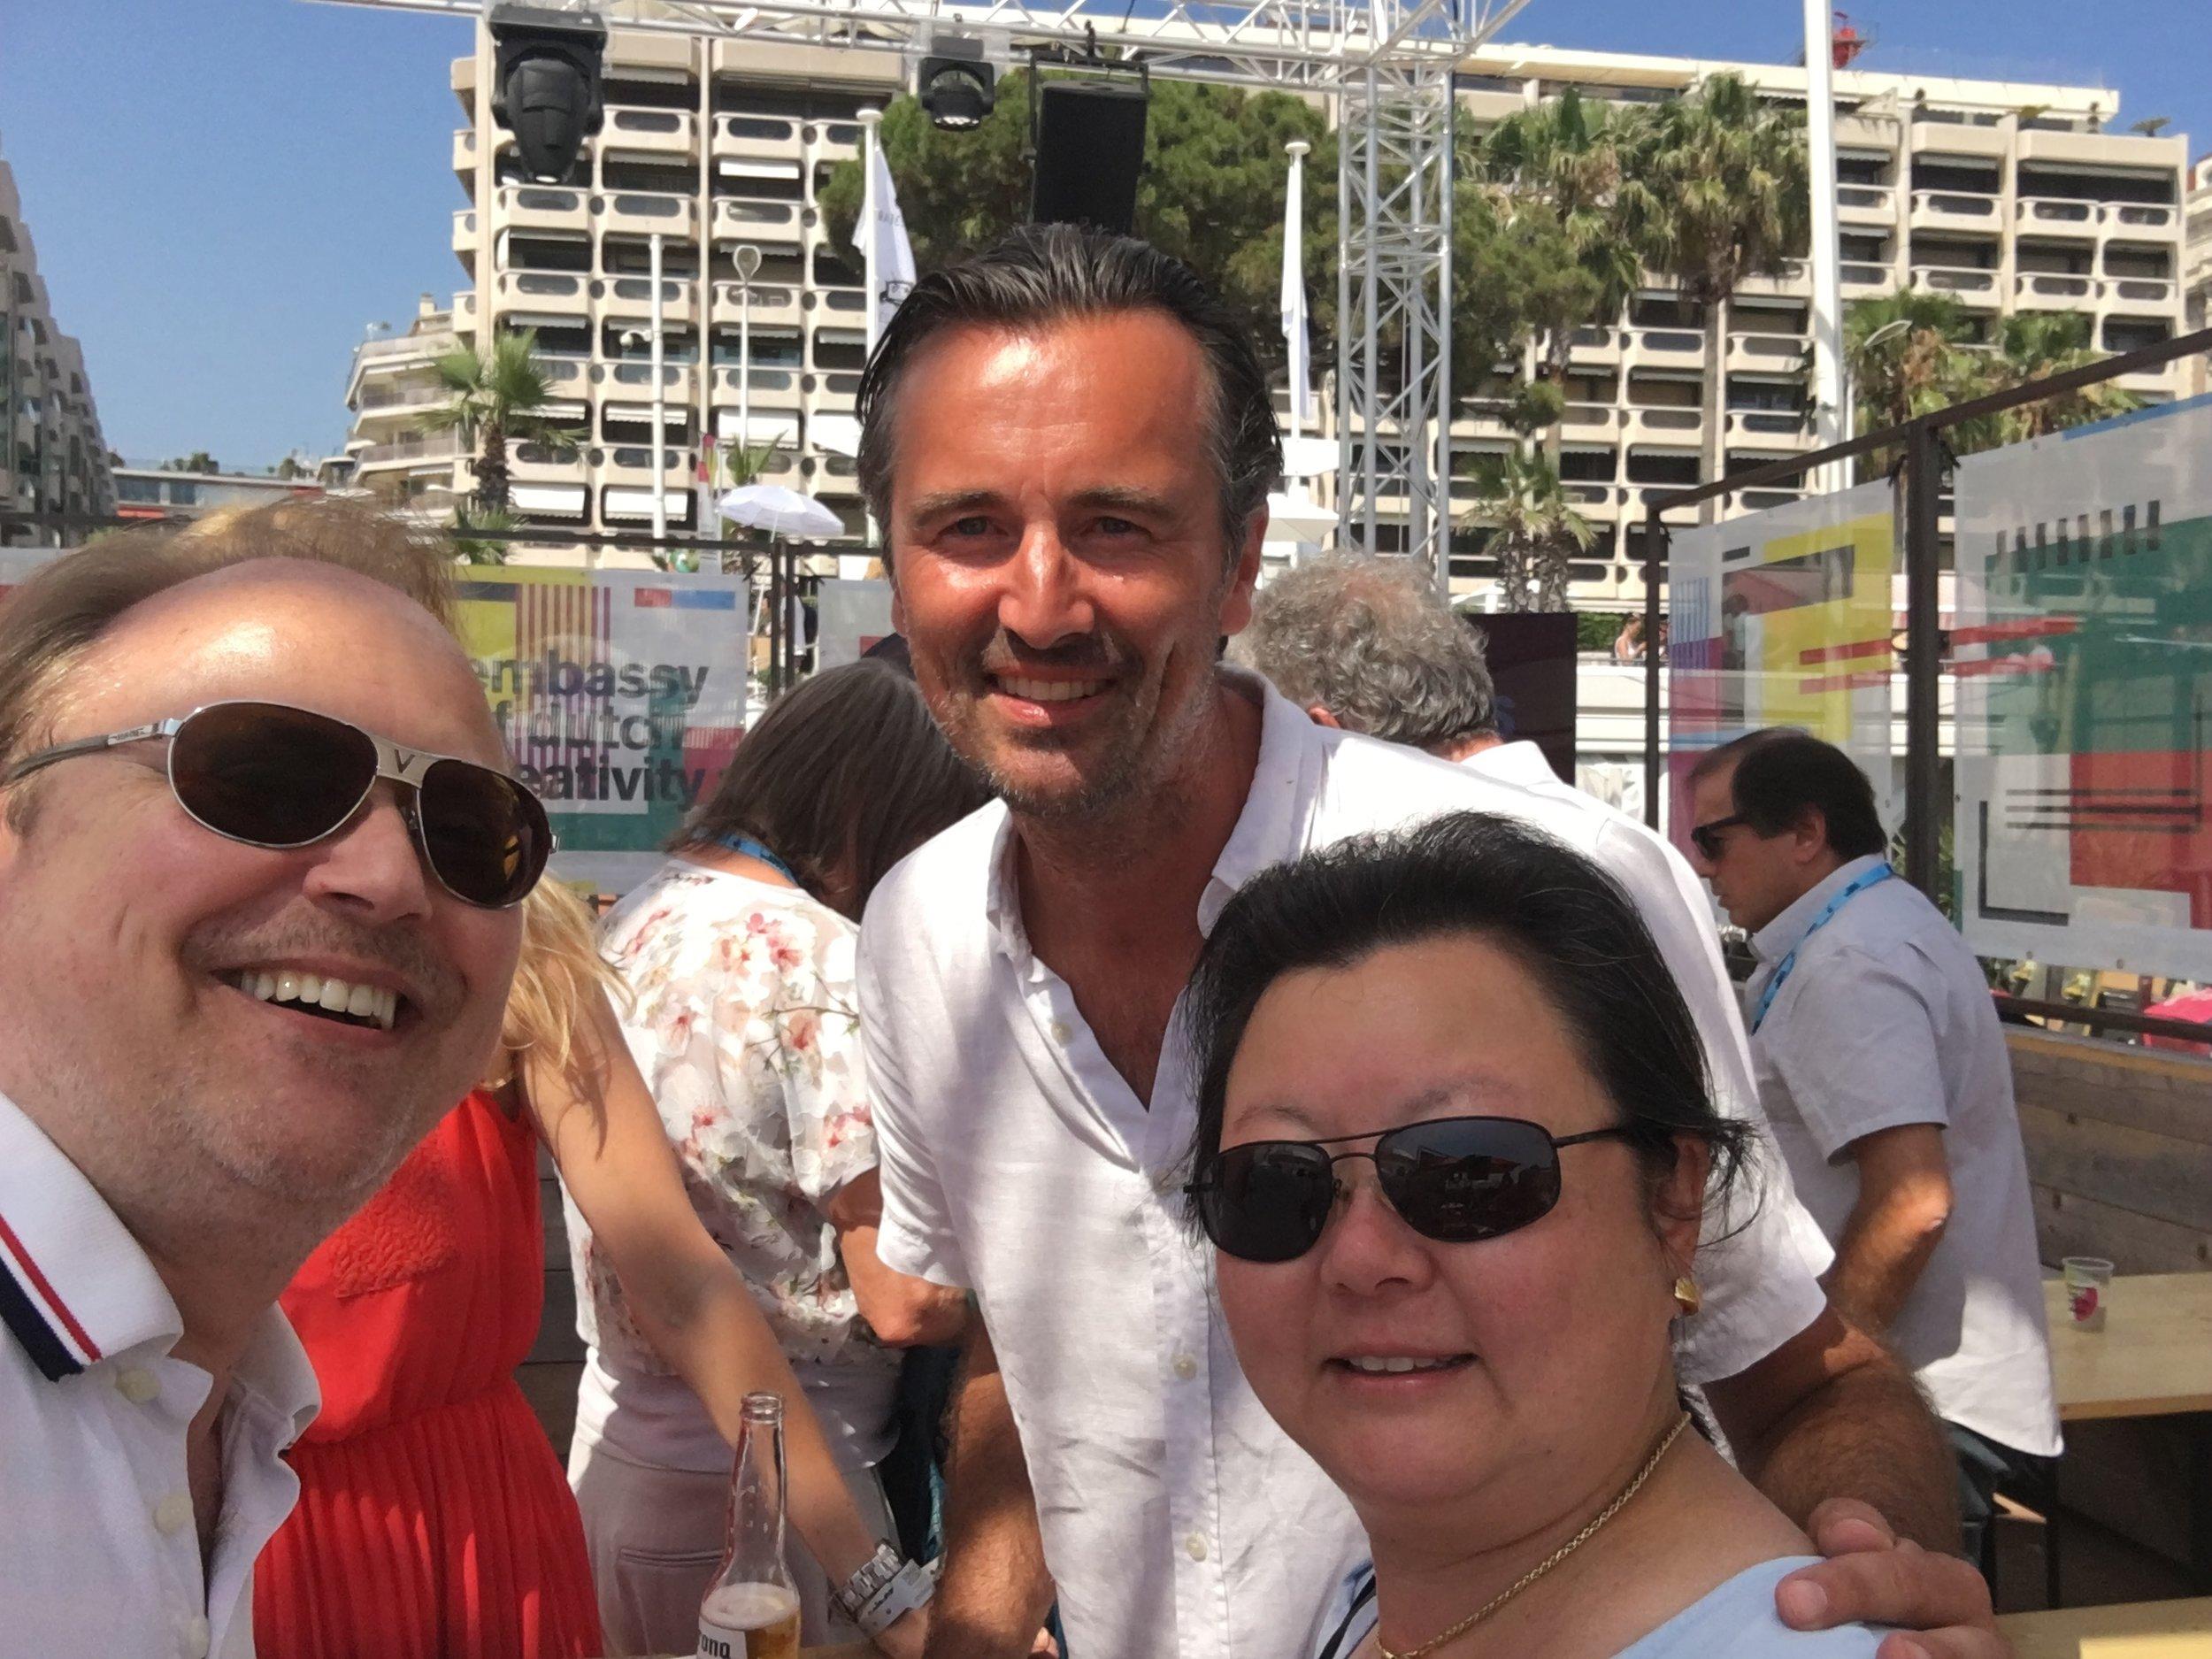 TNW CEO & Co-founder Boris Veldhuijzen Van Zanten with Christopher and Nathalie Mindus